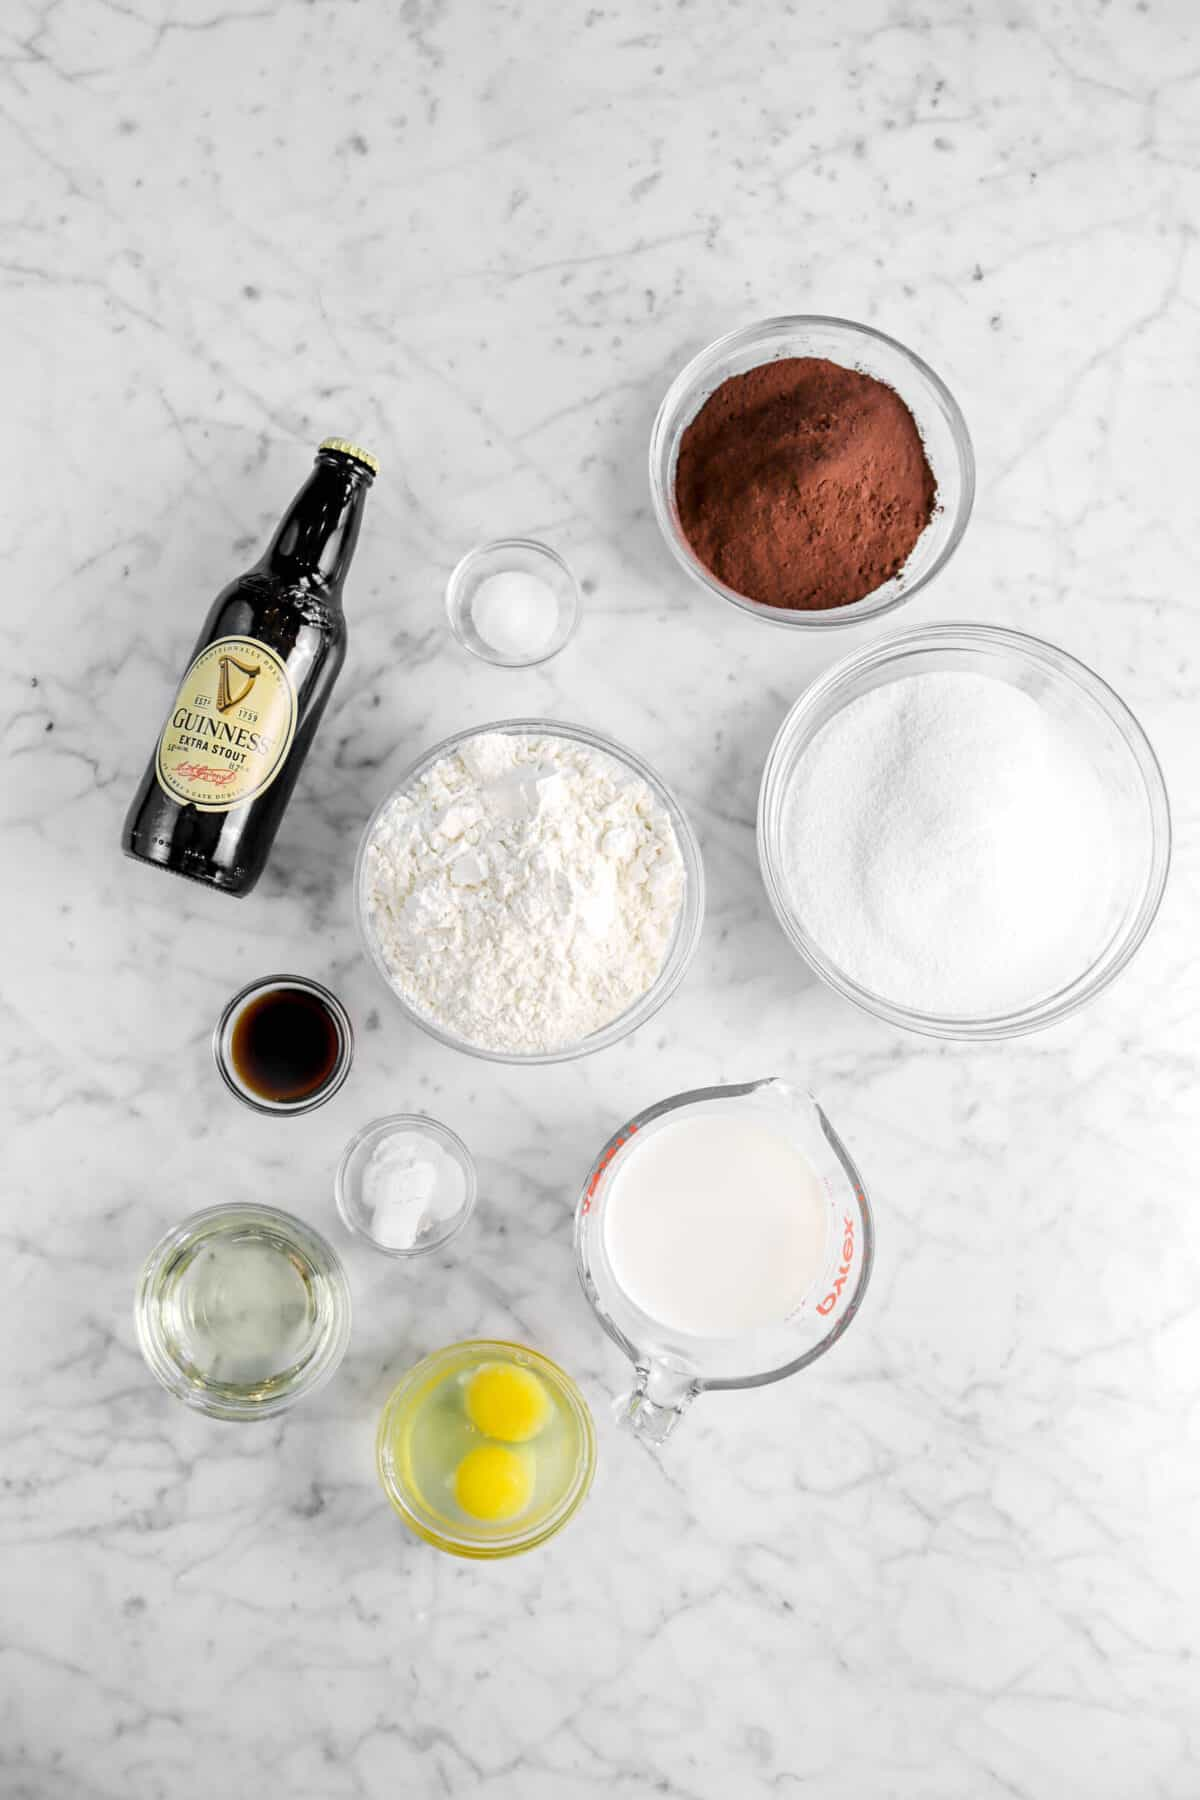 cocoa powder, salt, sugar, flour, beer, vanilla, baking powder, milk, eggs, and vegetable oil on marble counter